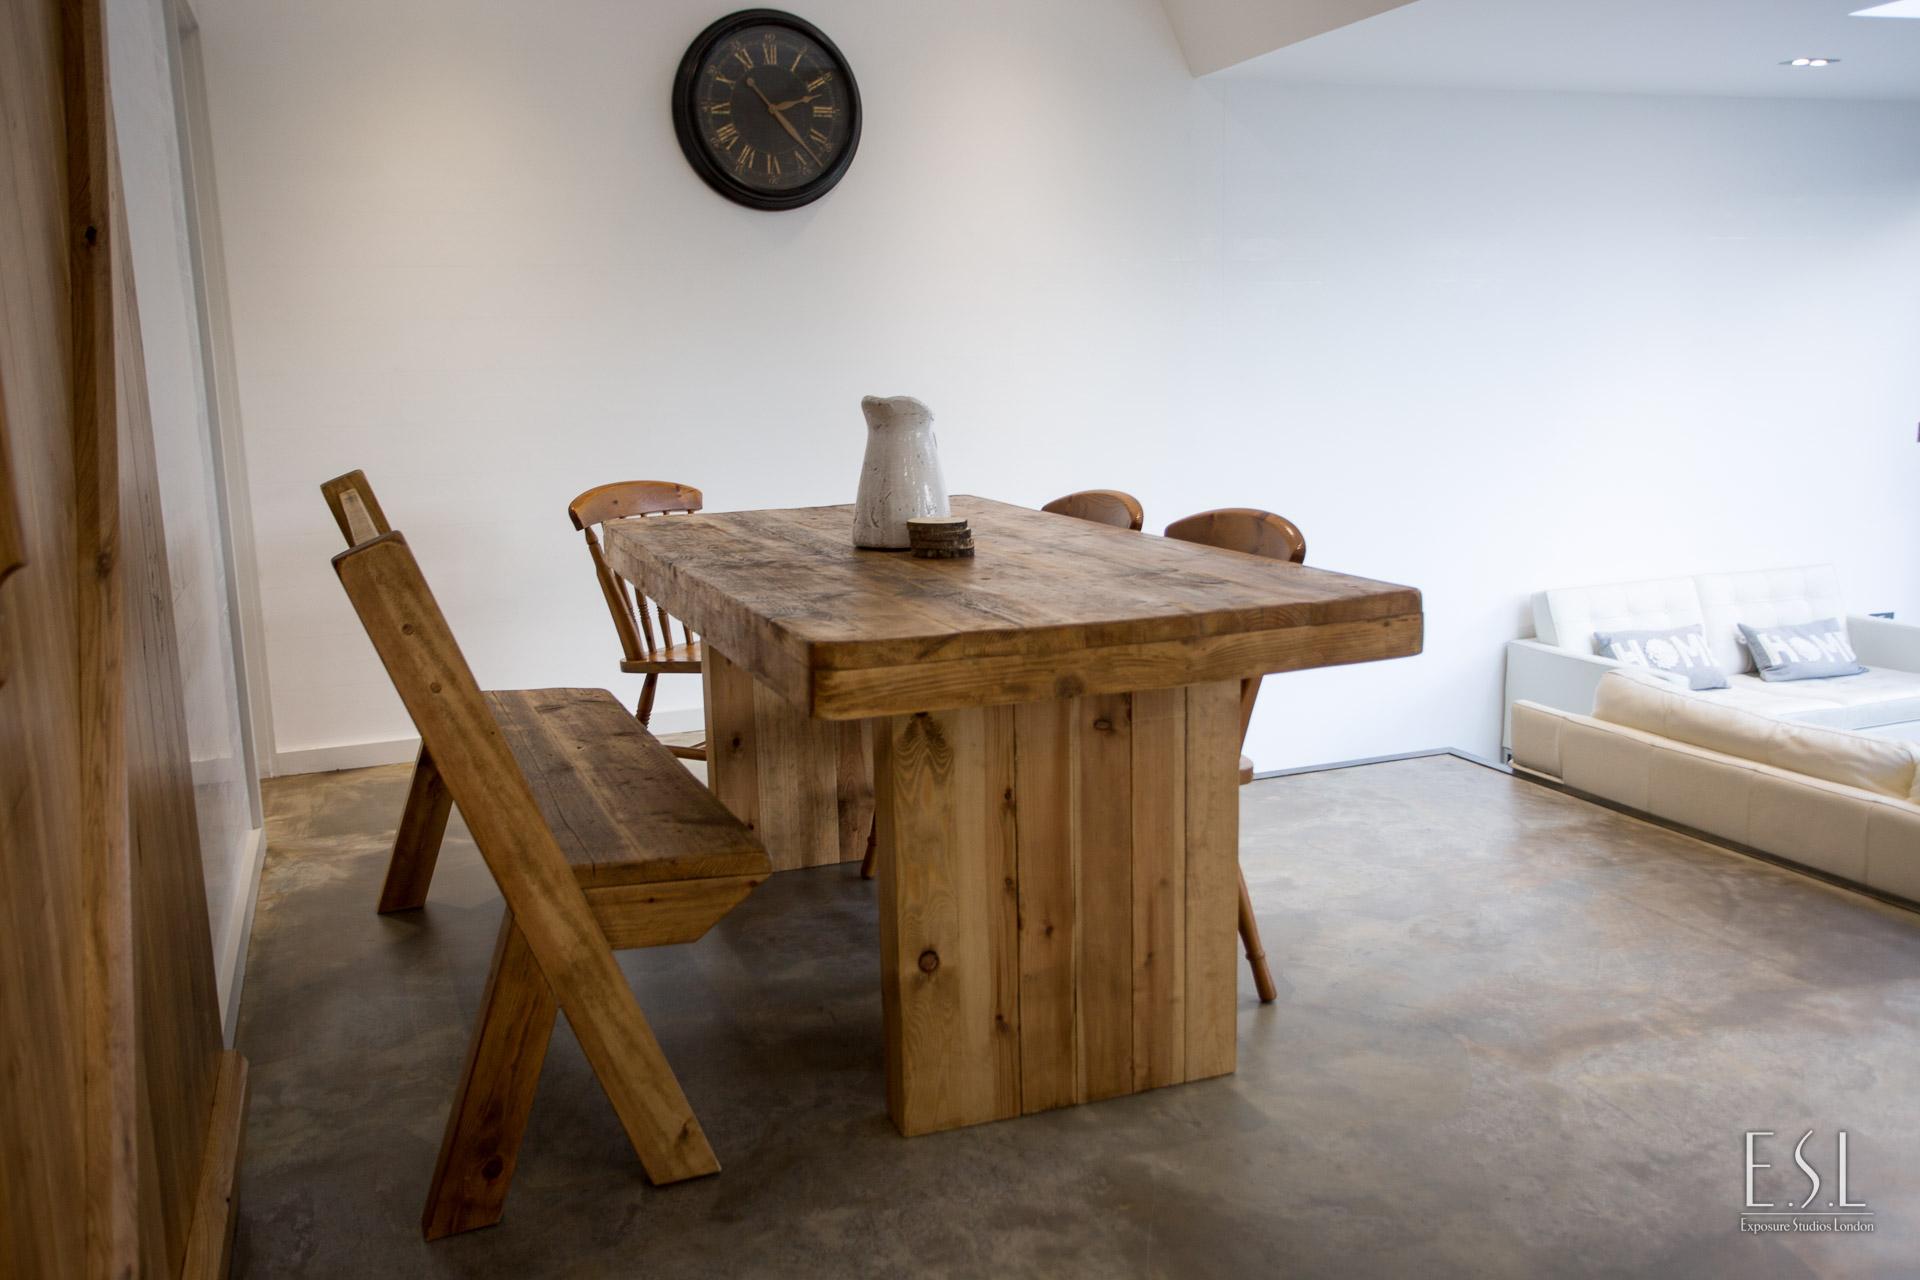 Builders, Winchmore Hill, London House rennovation & Refurbishment 19